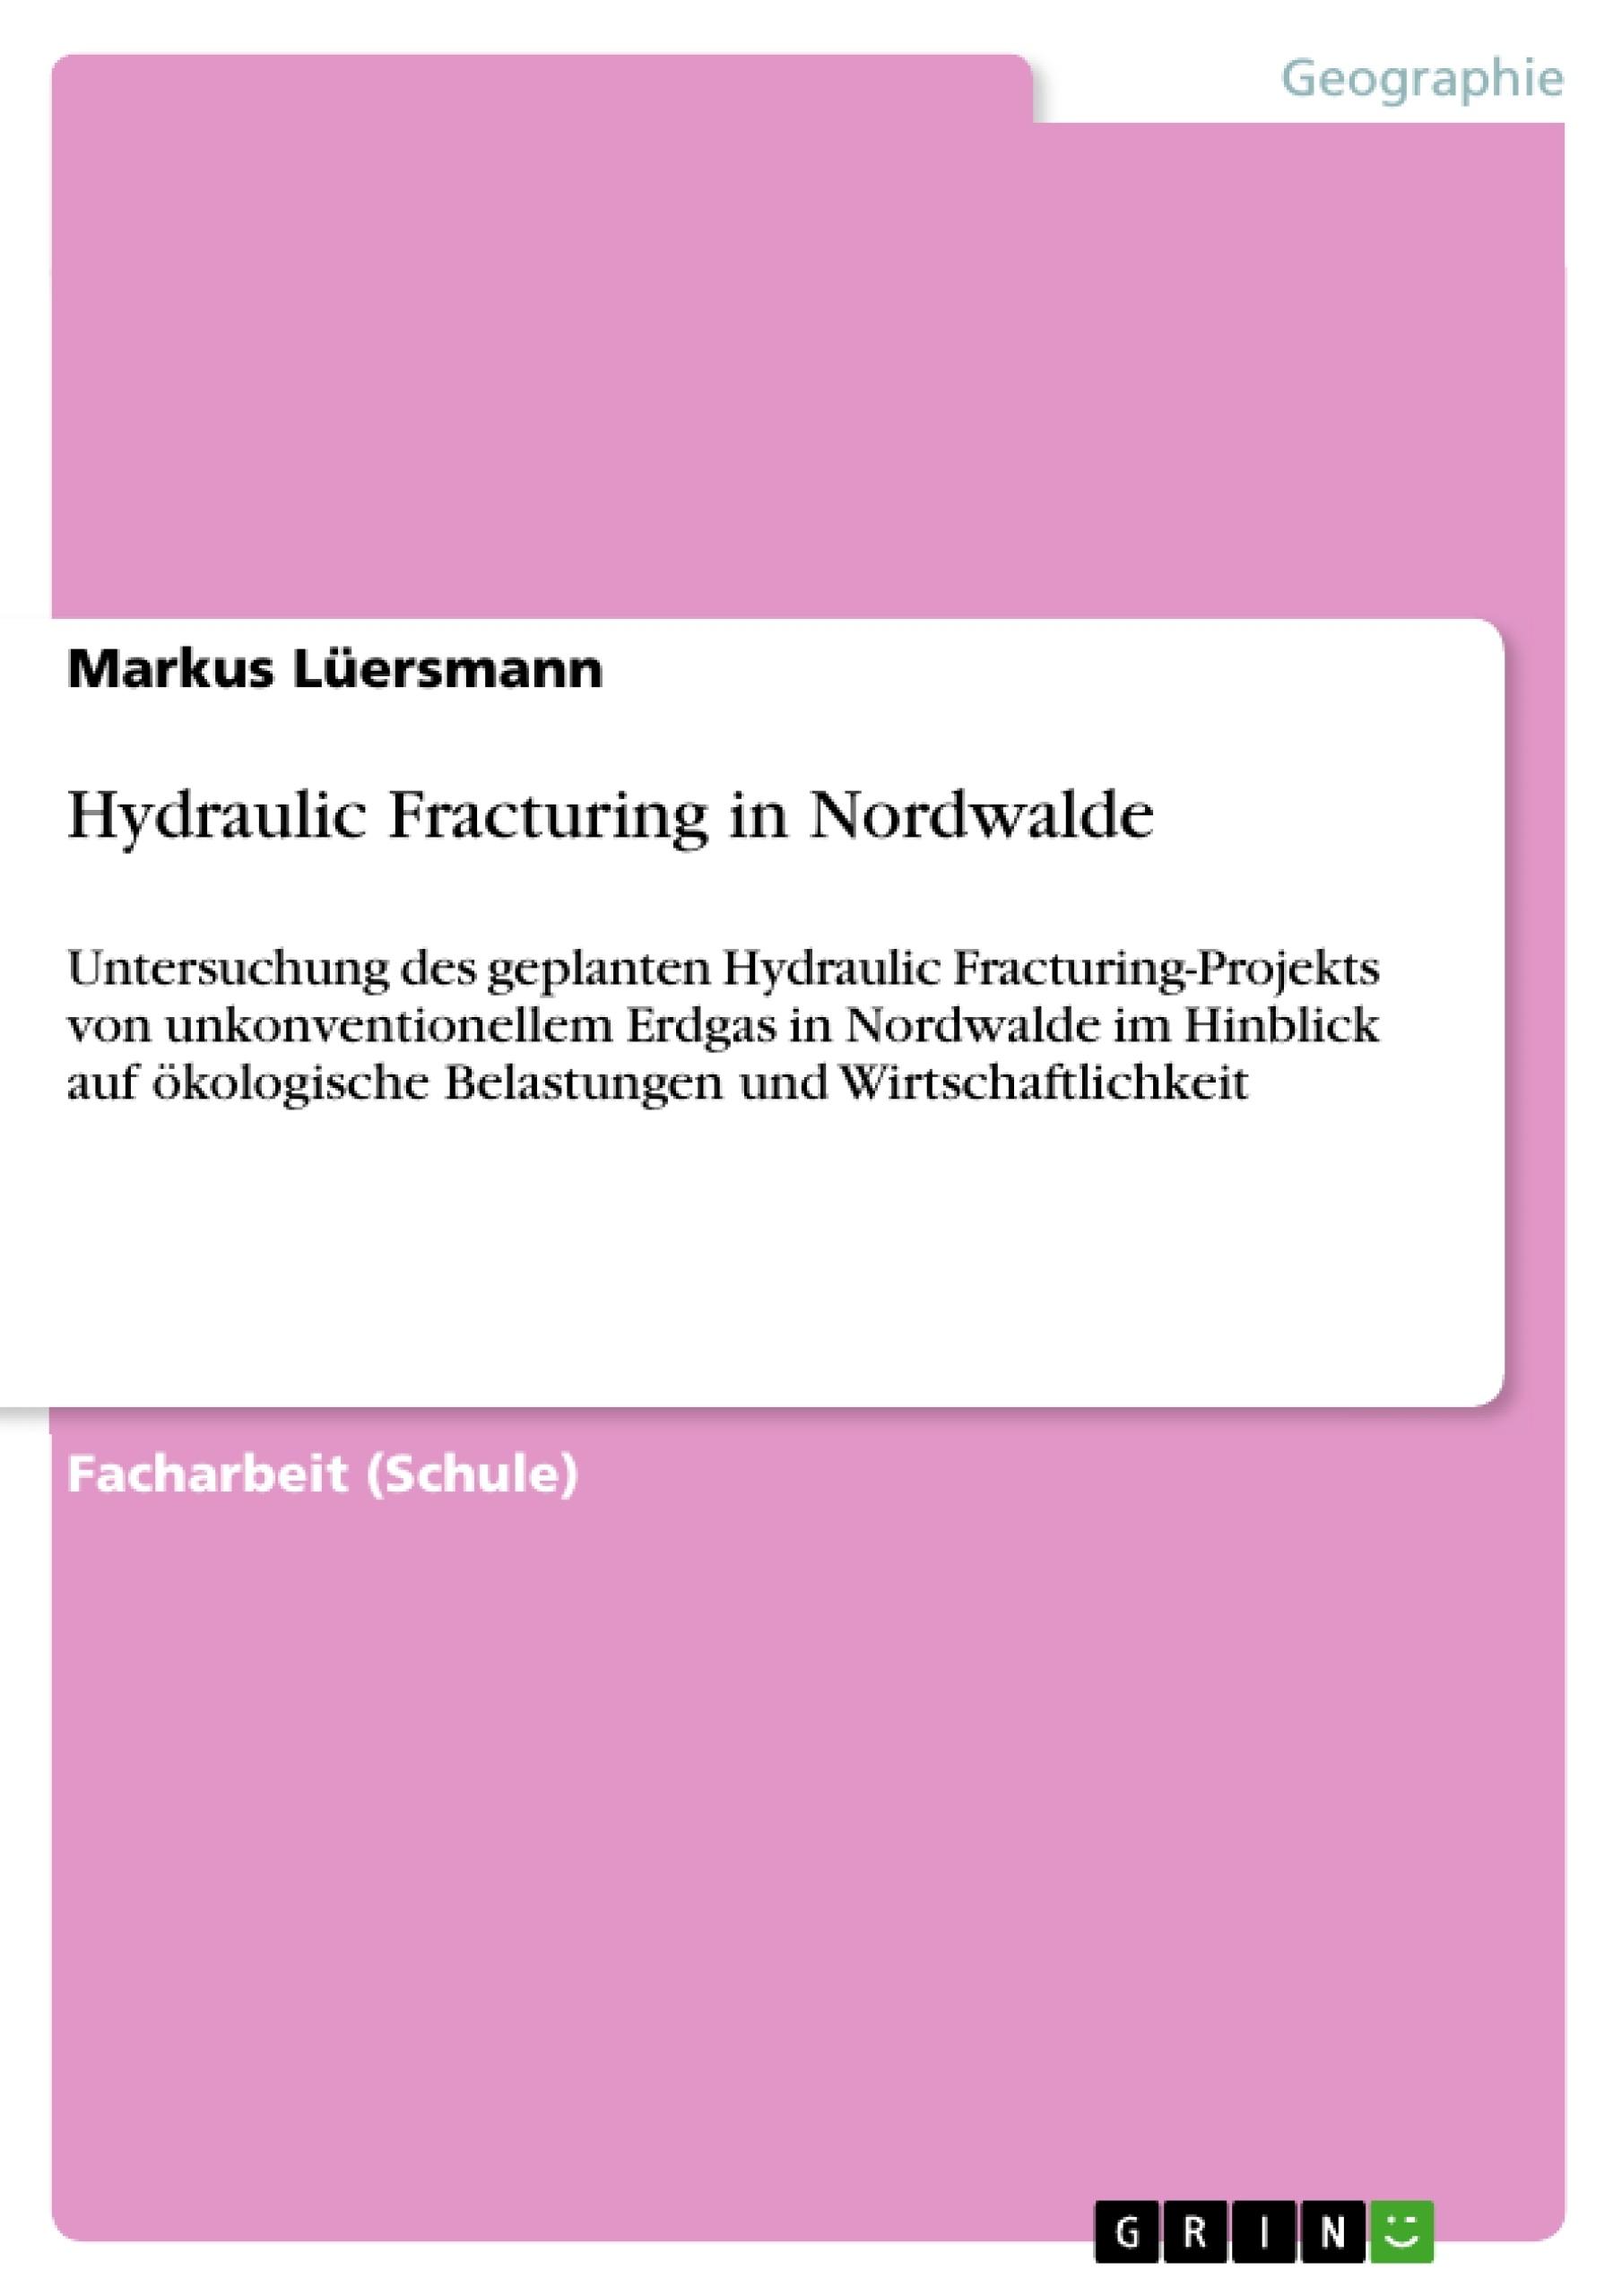 Titel: Hydraulic Fracturing in Nordwalde